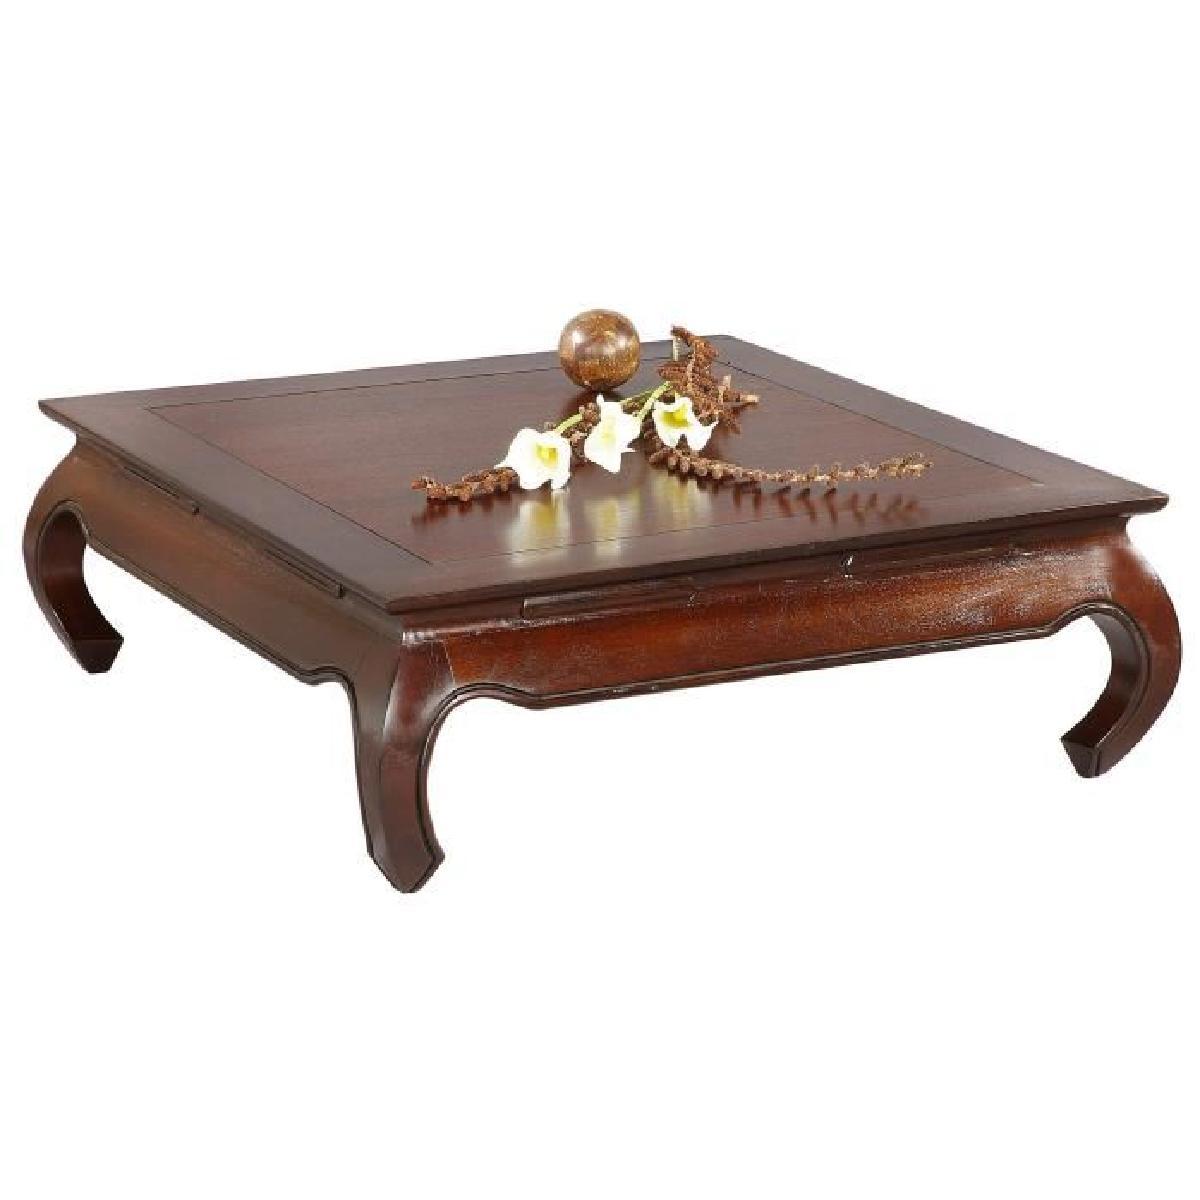 table basse ethnique pas cher mobilier design. Black Bedroom Furniture Sets. Home Design Ideas